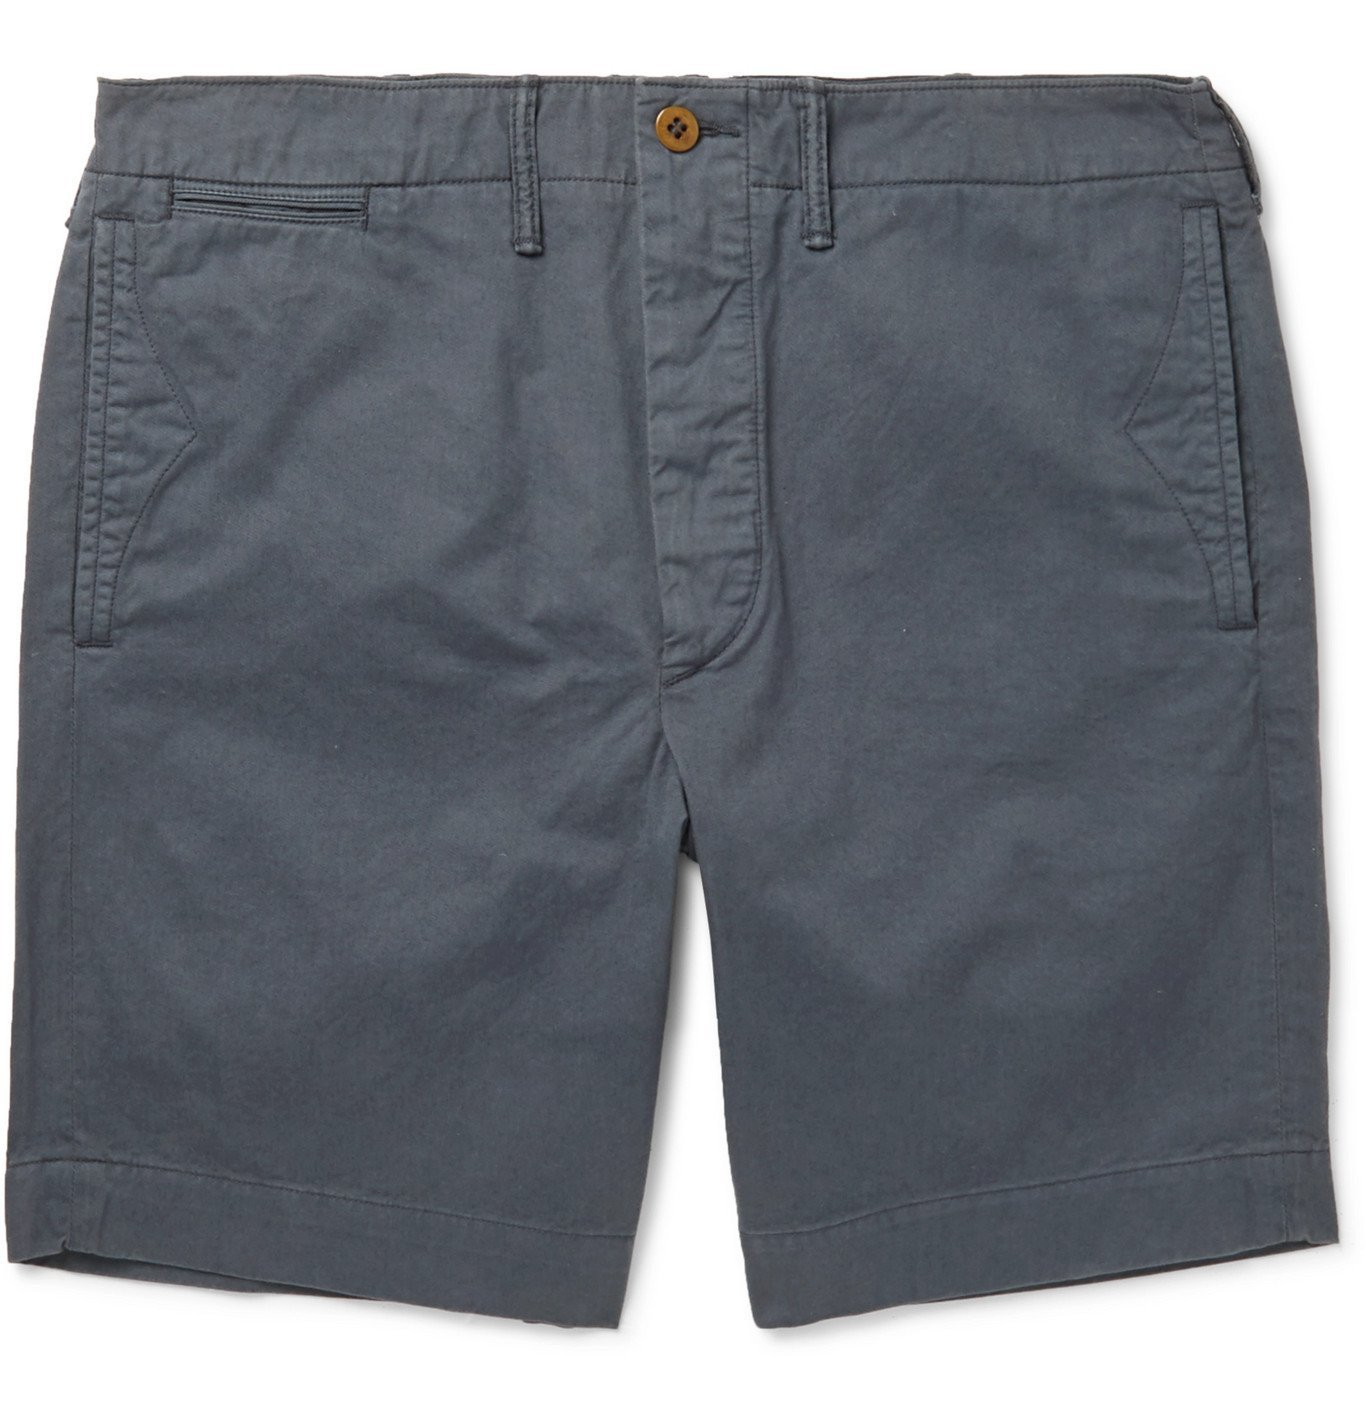 RRL - Slim-Fit Cotton-Twill Chino Shorts - Blue